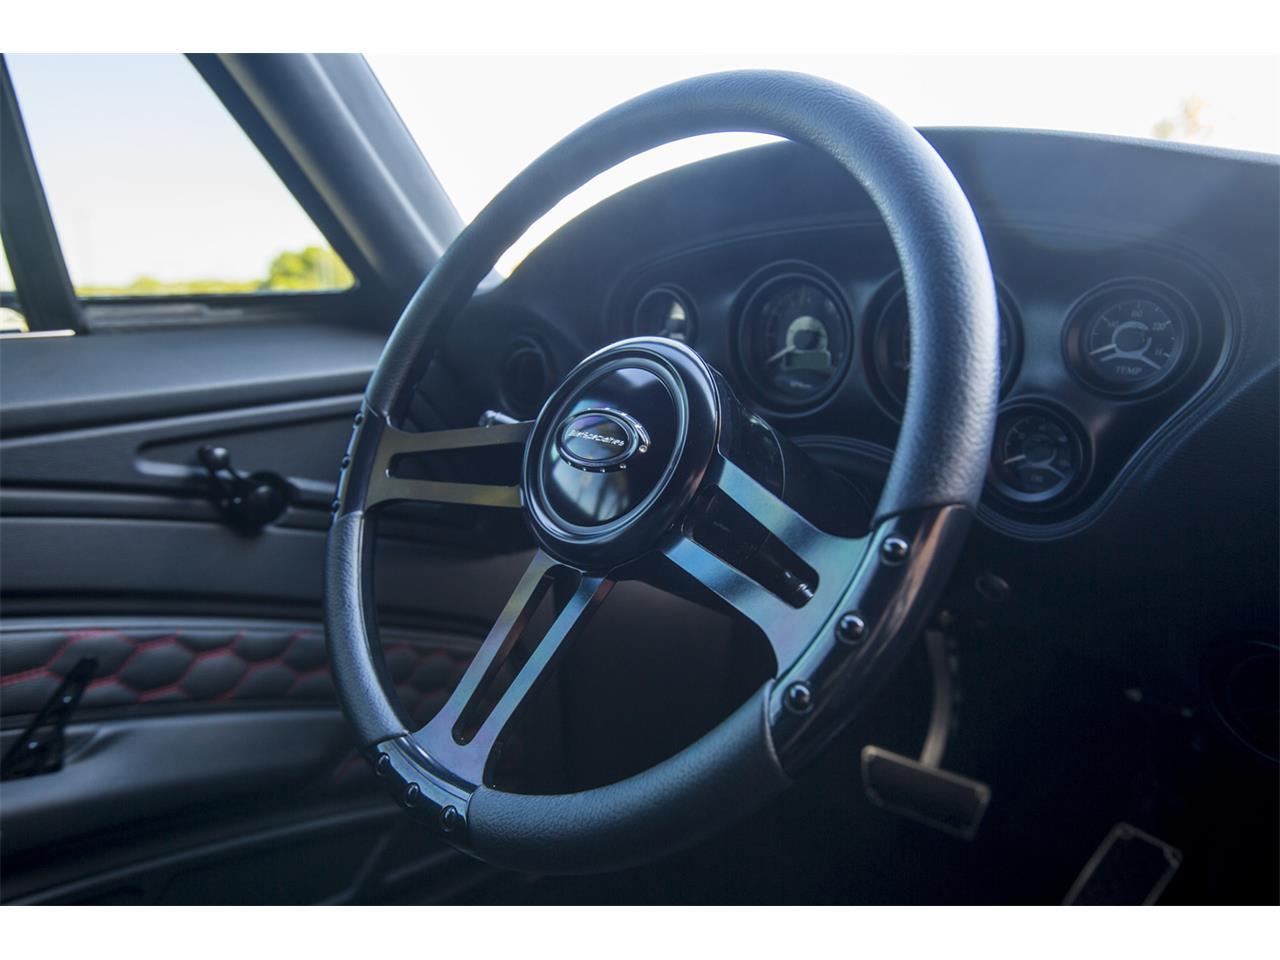 1968 Chevrolet Chevelle (CC-1275842) for sale in Pensacola, Florida